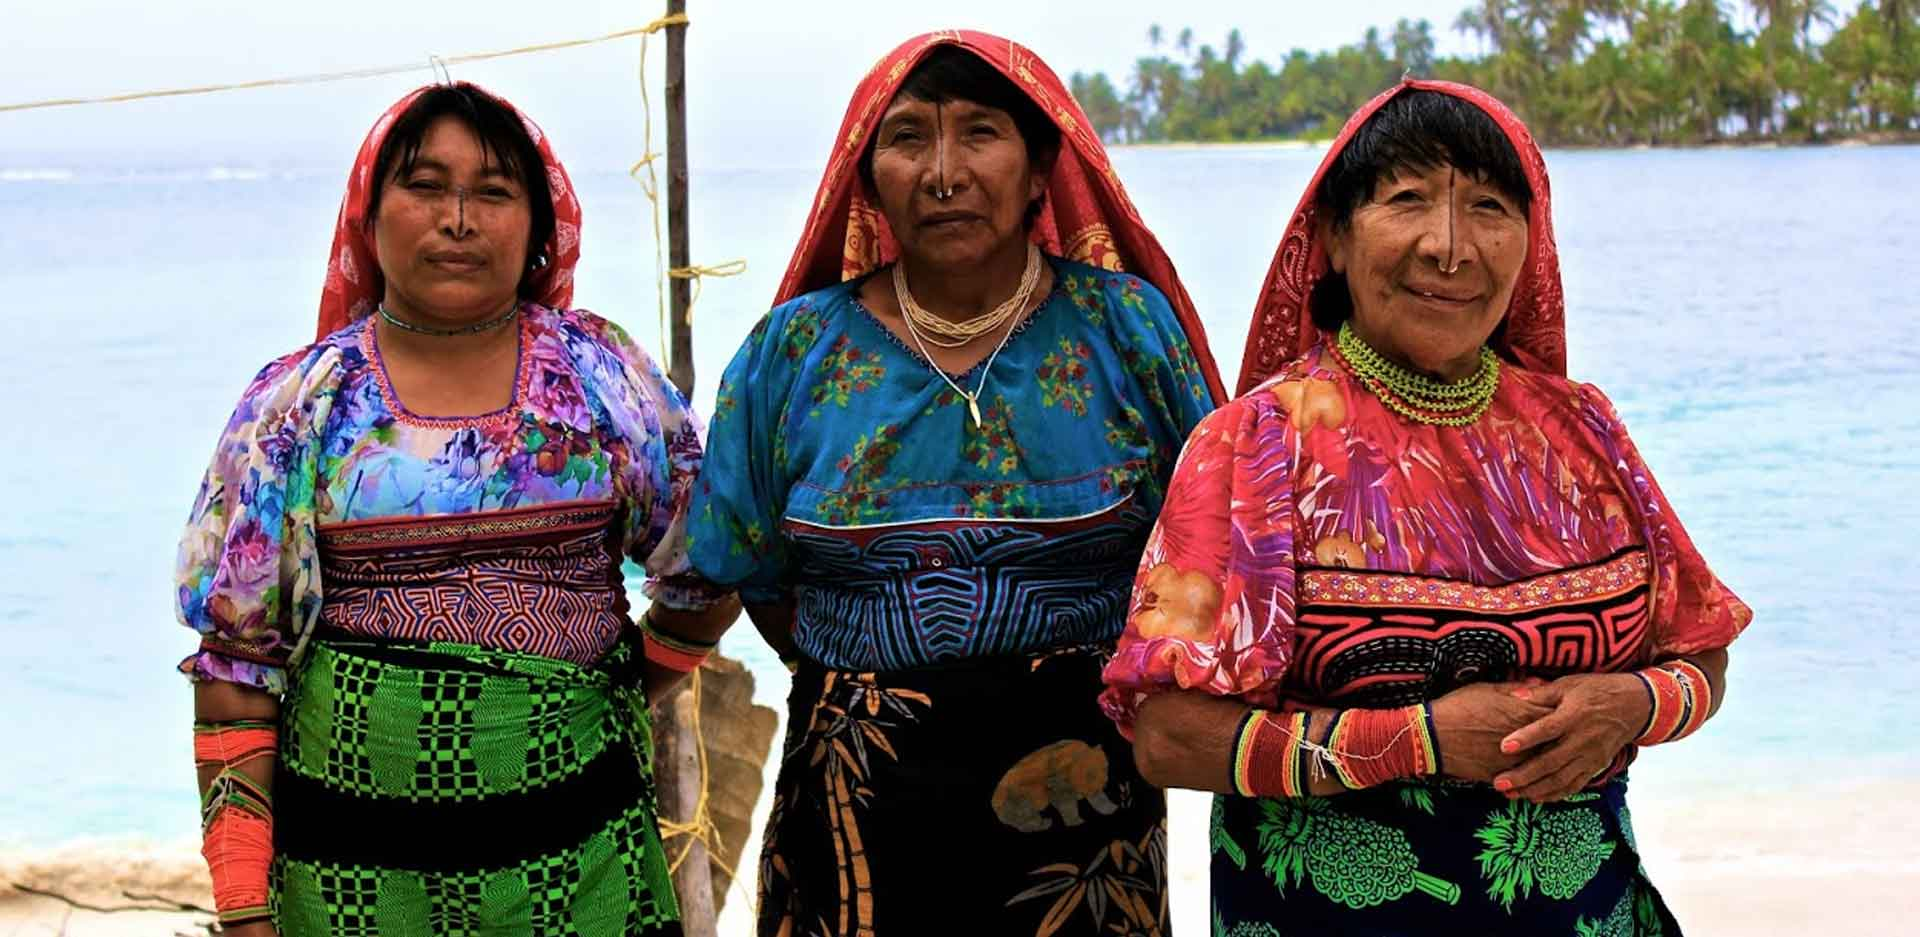 San Blas Archipelago – Kuna Kingdom - Panama, San Blas Islands, Kuna Community